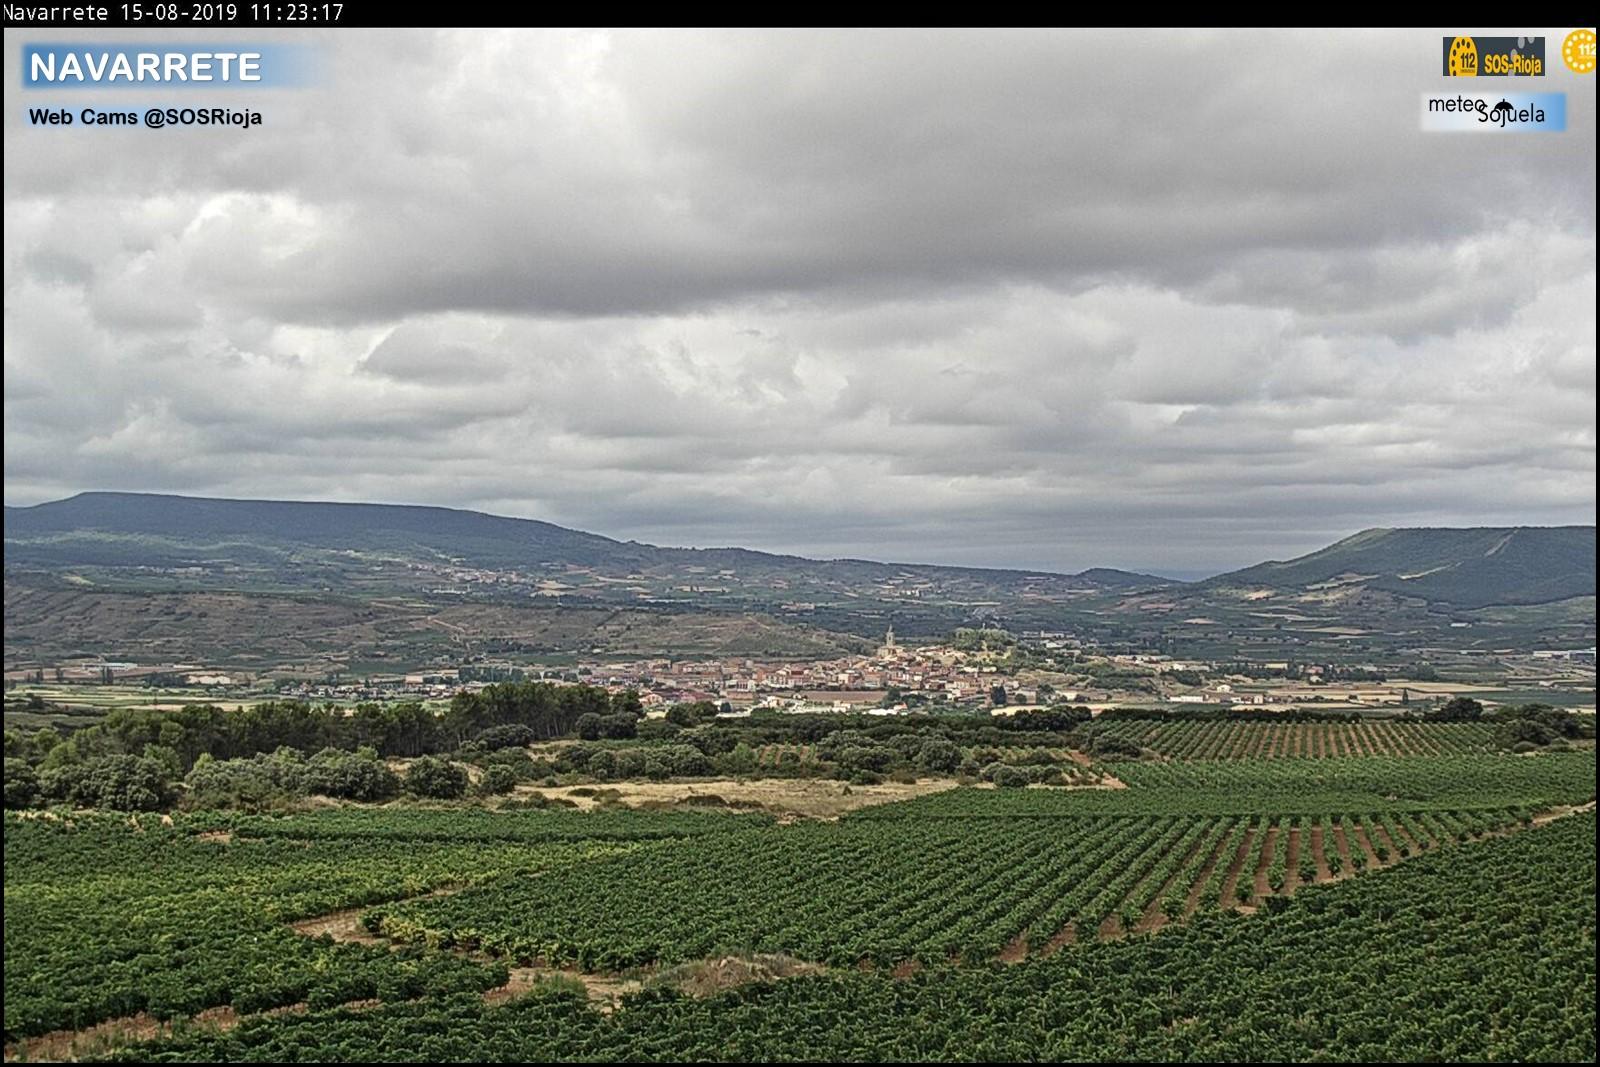 Web Cam SOS Rioja Navarrete